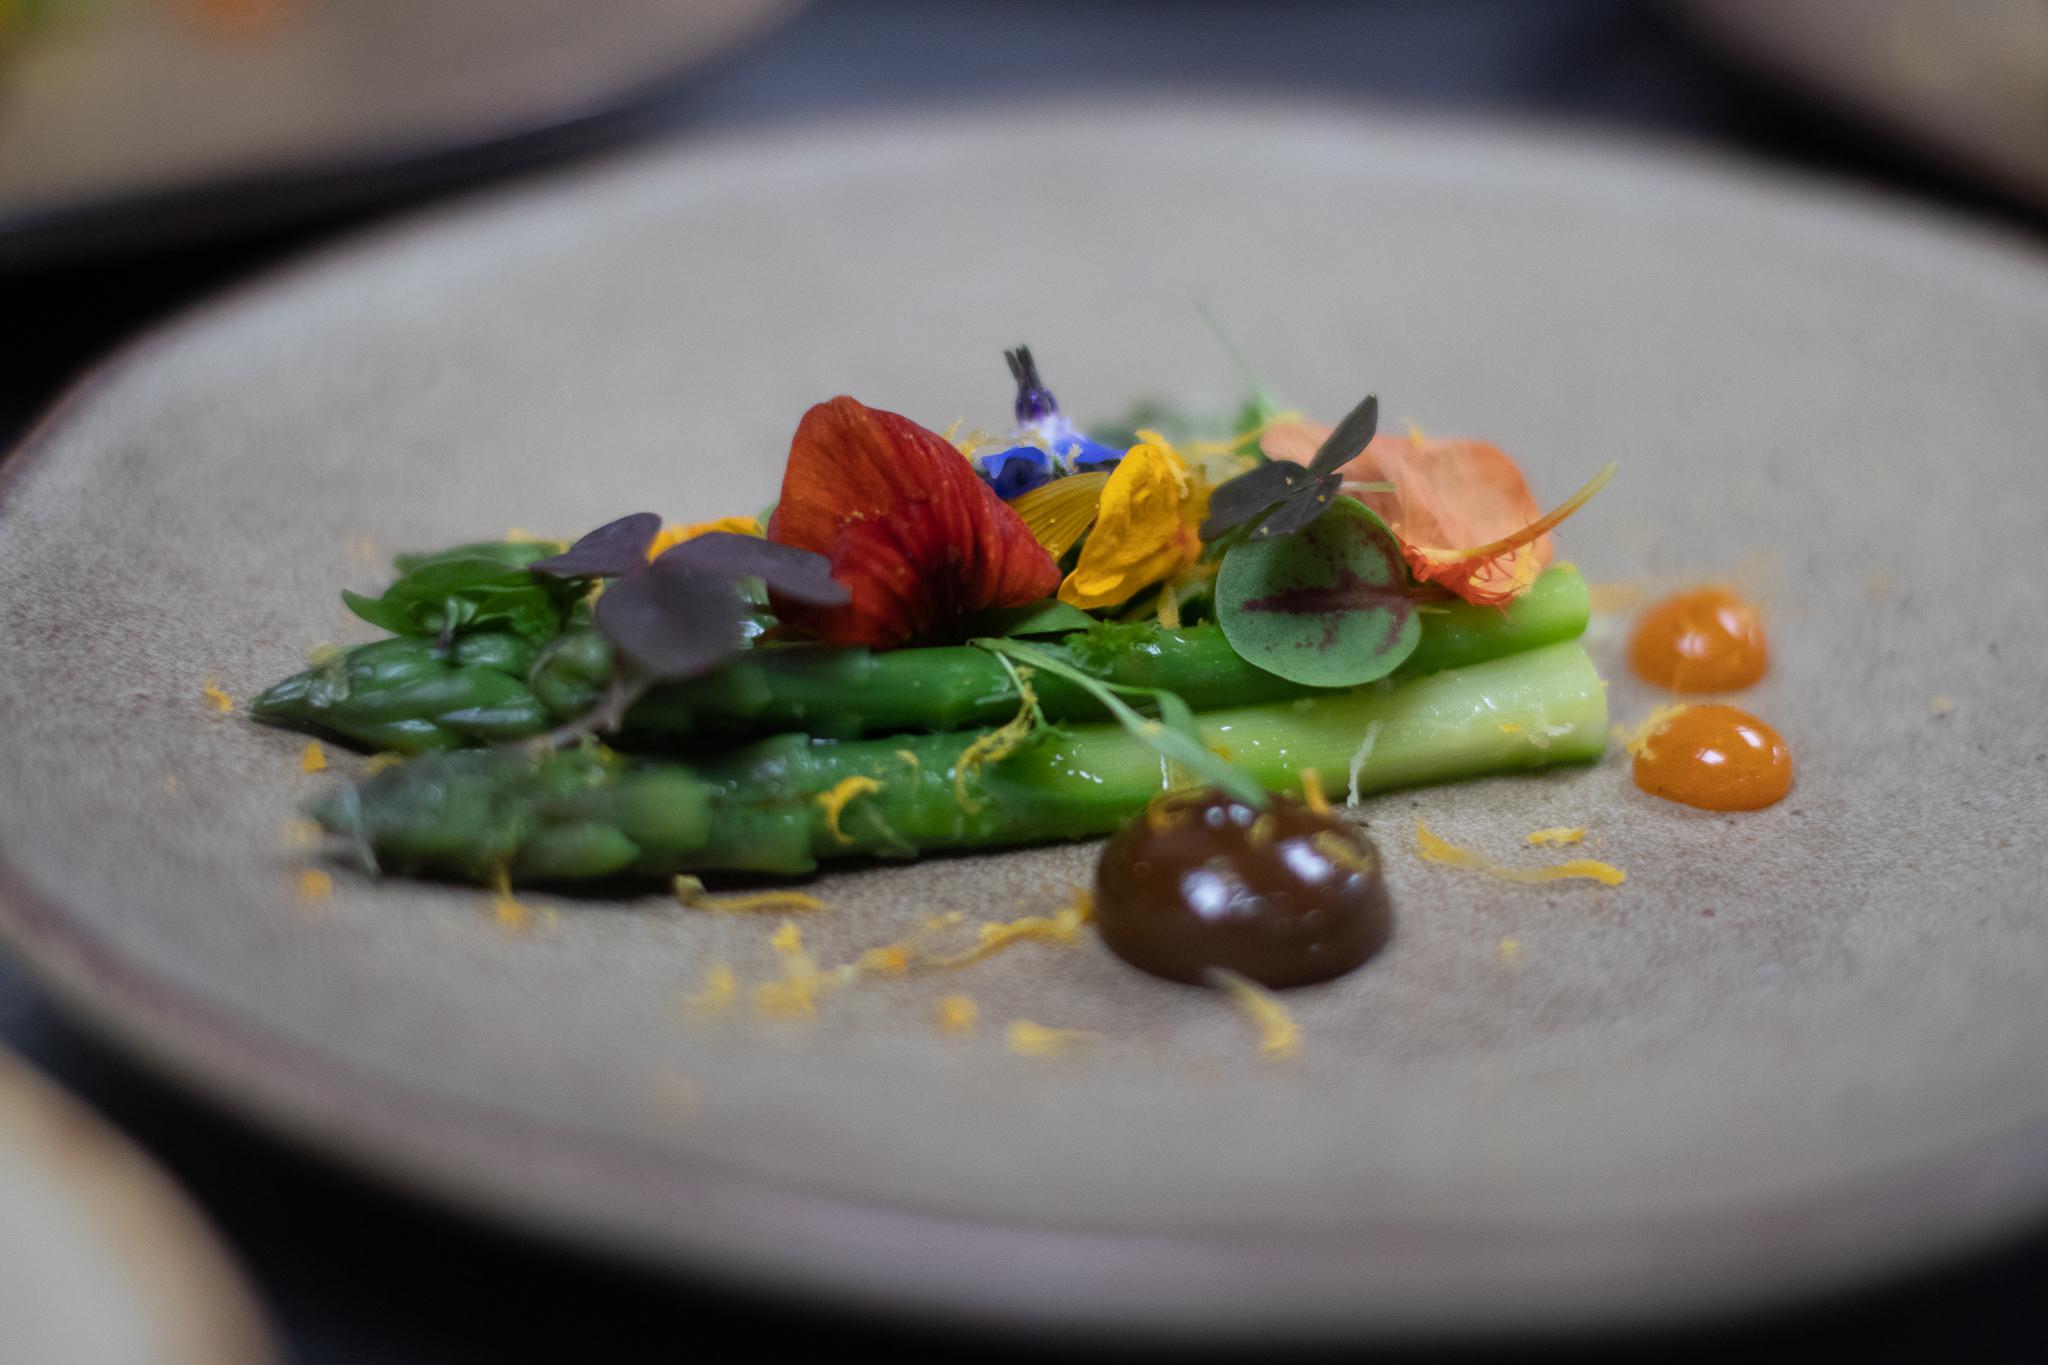 A taste of Norfolk in the heart of Mayfair